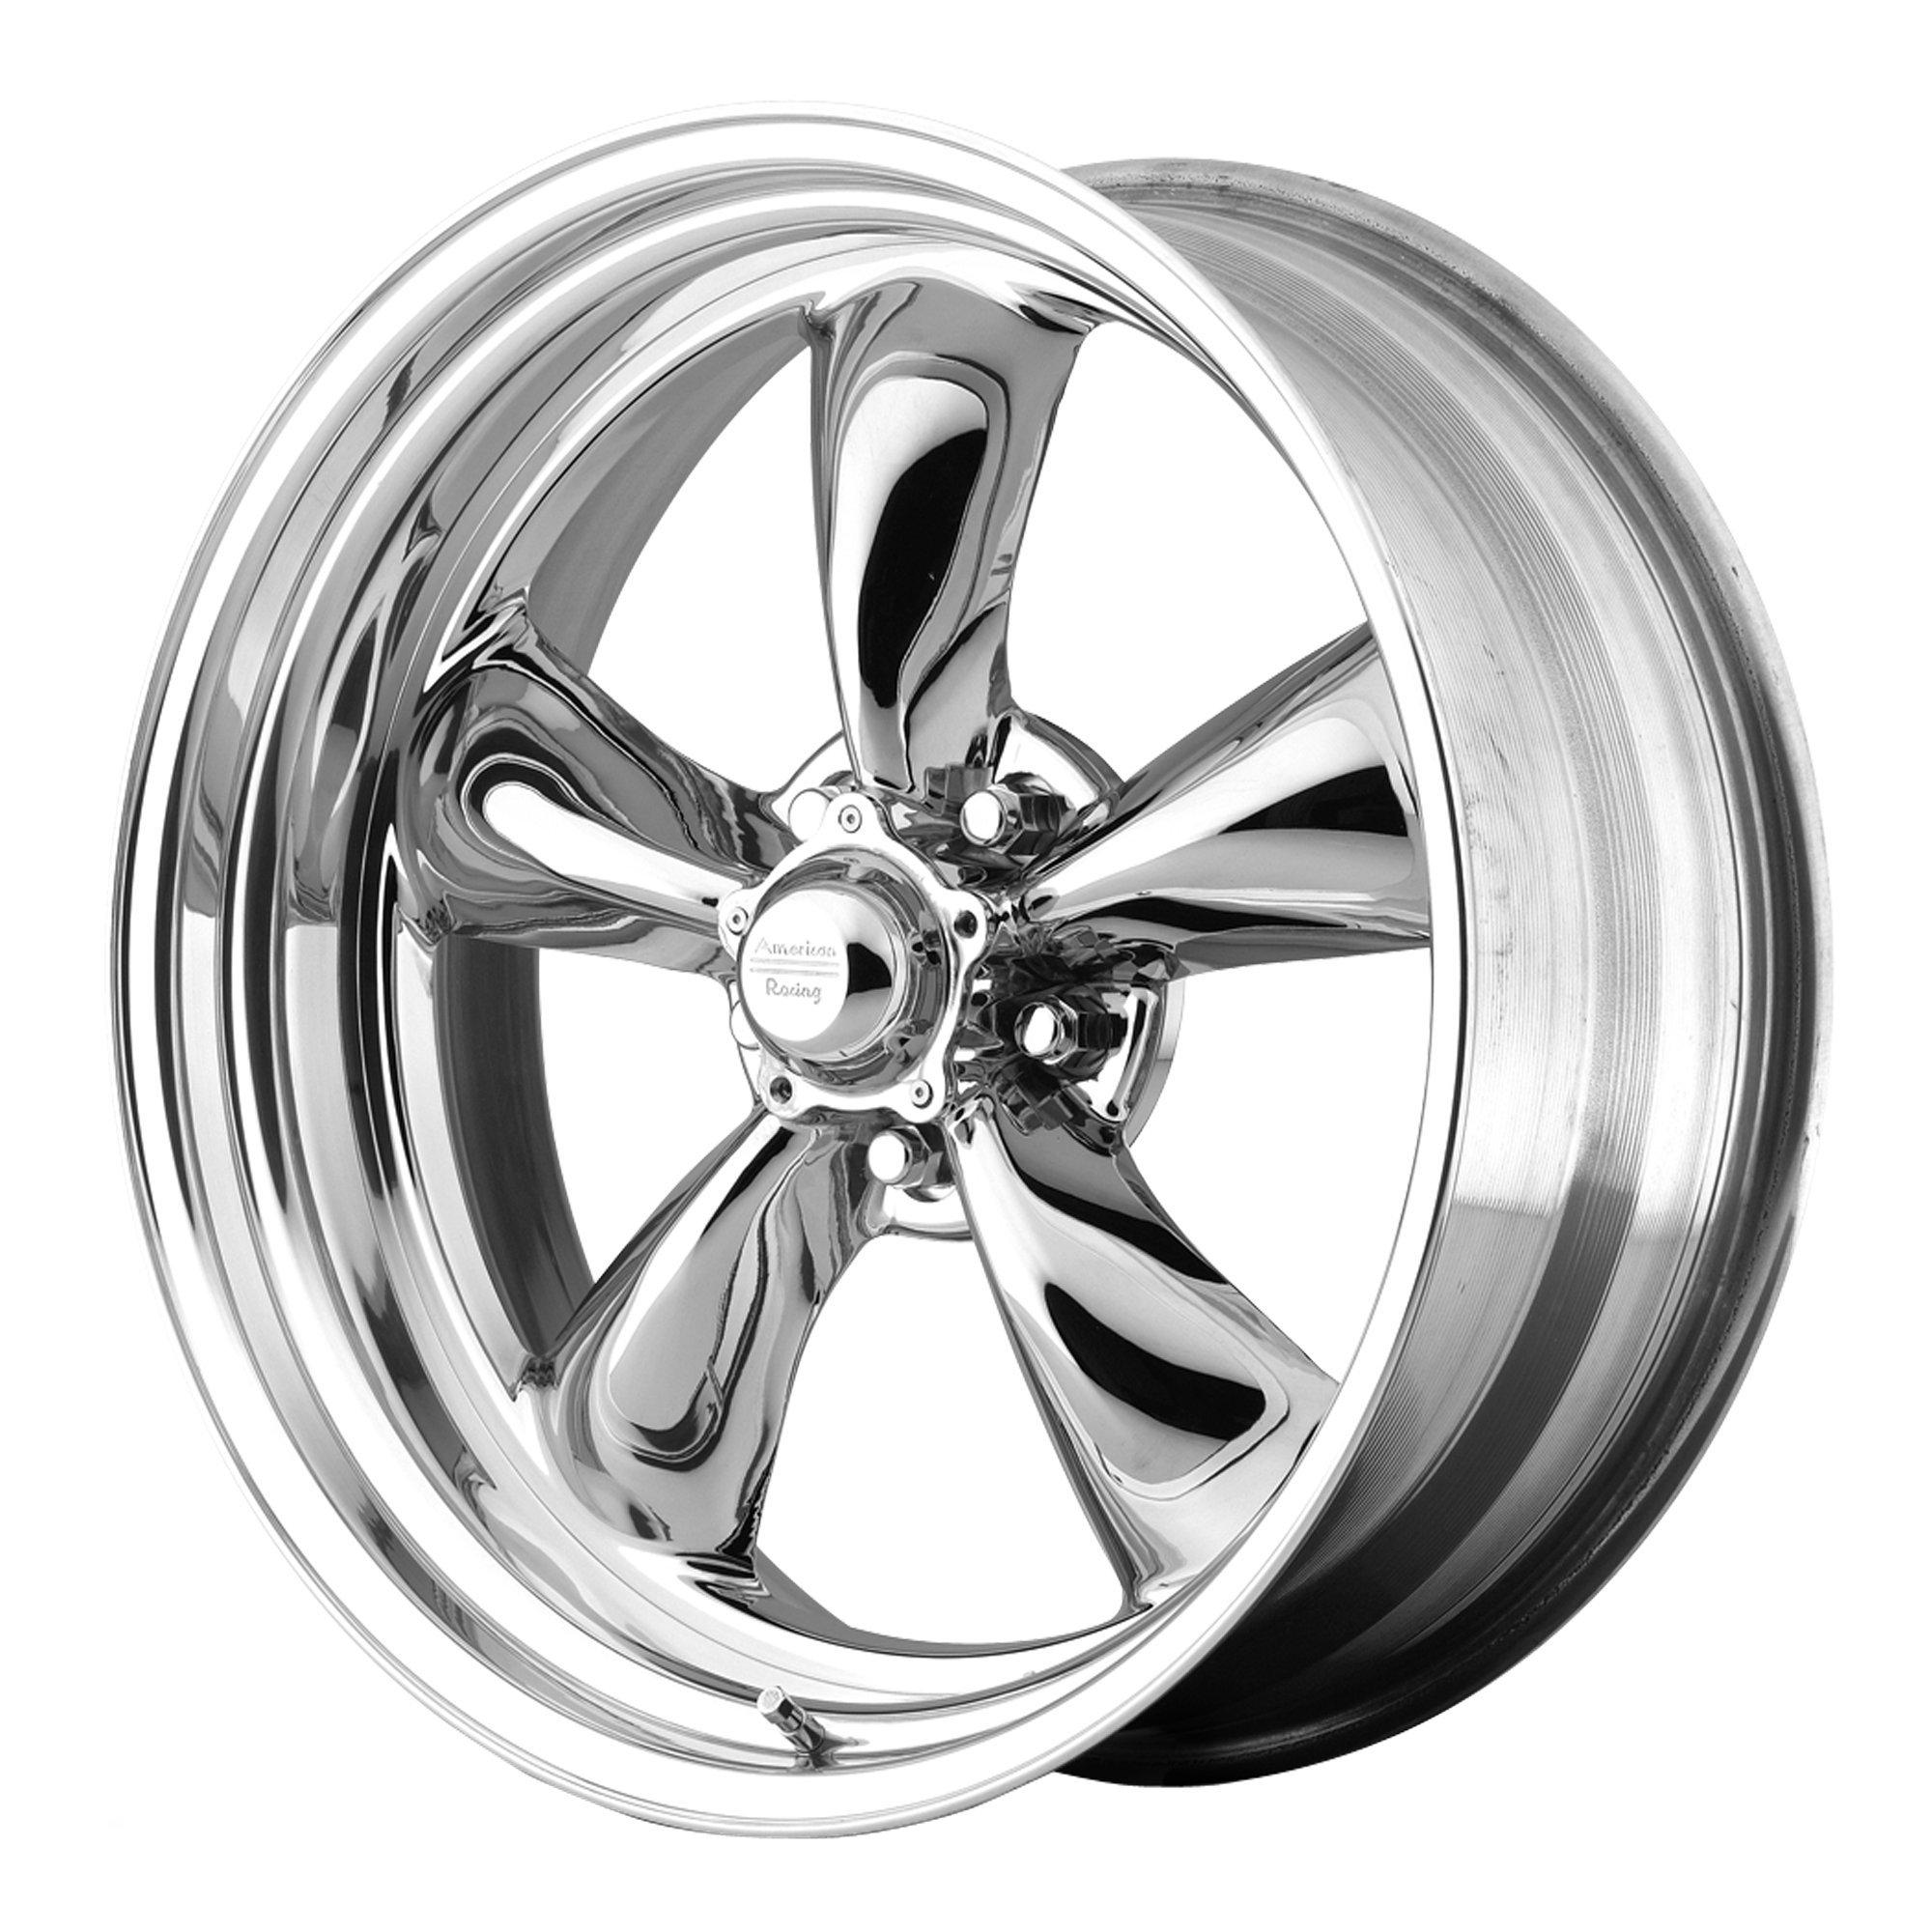 American Racing VN815 Torq Thrust II 1-Piece PVD Wheel (20x10''/5x120.7mm, +6mm offset)